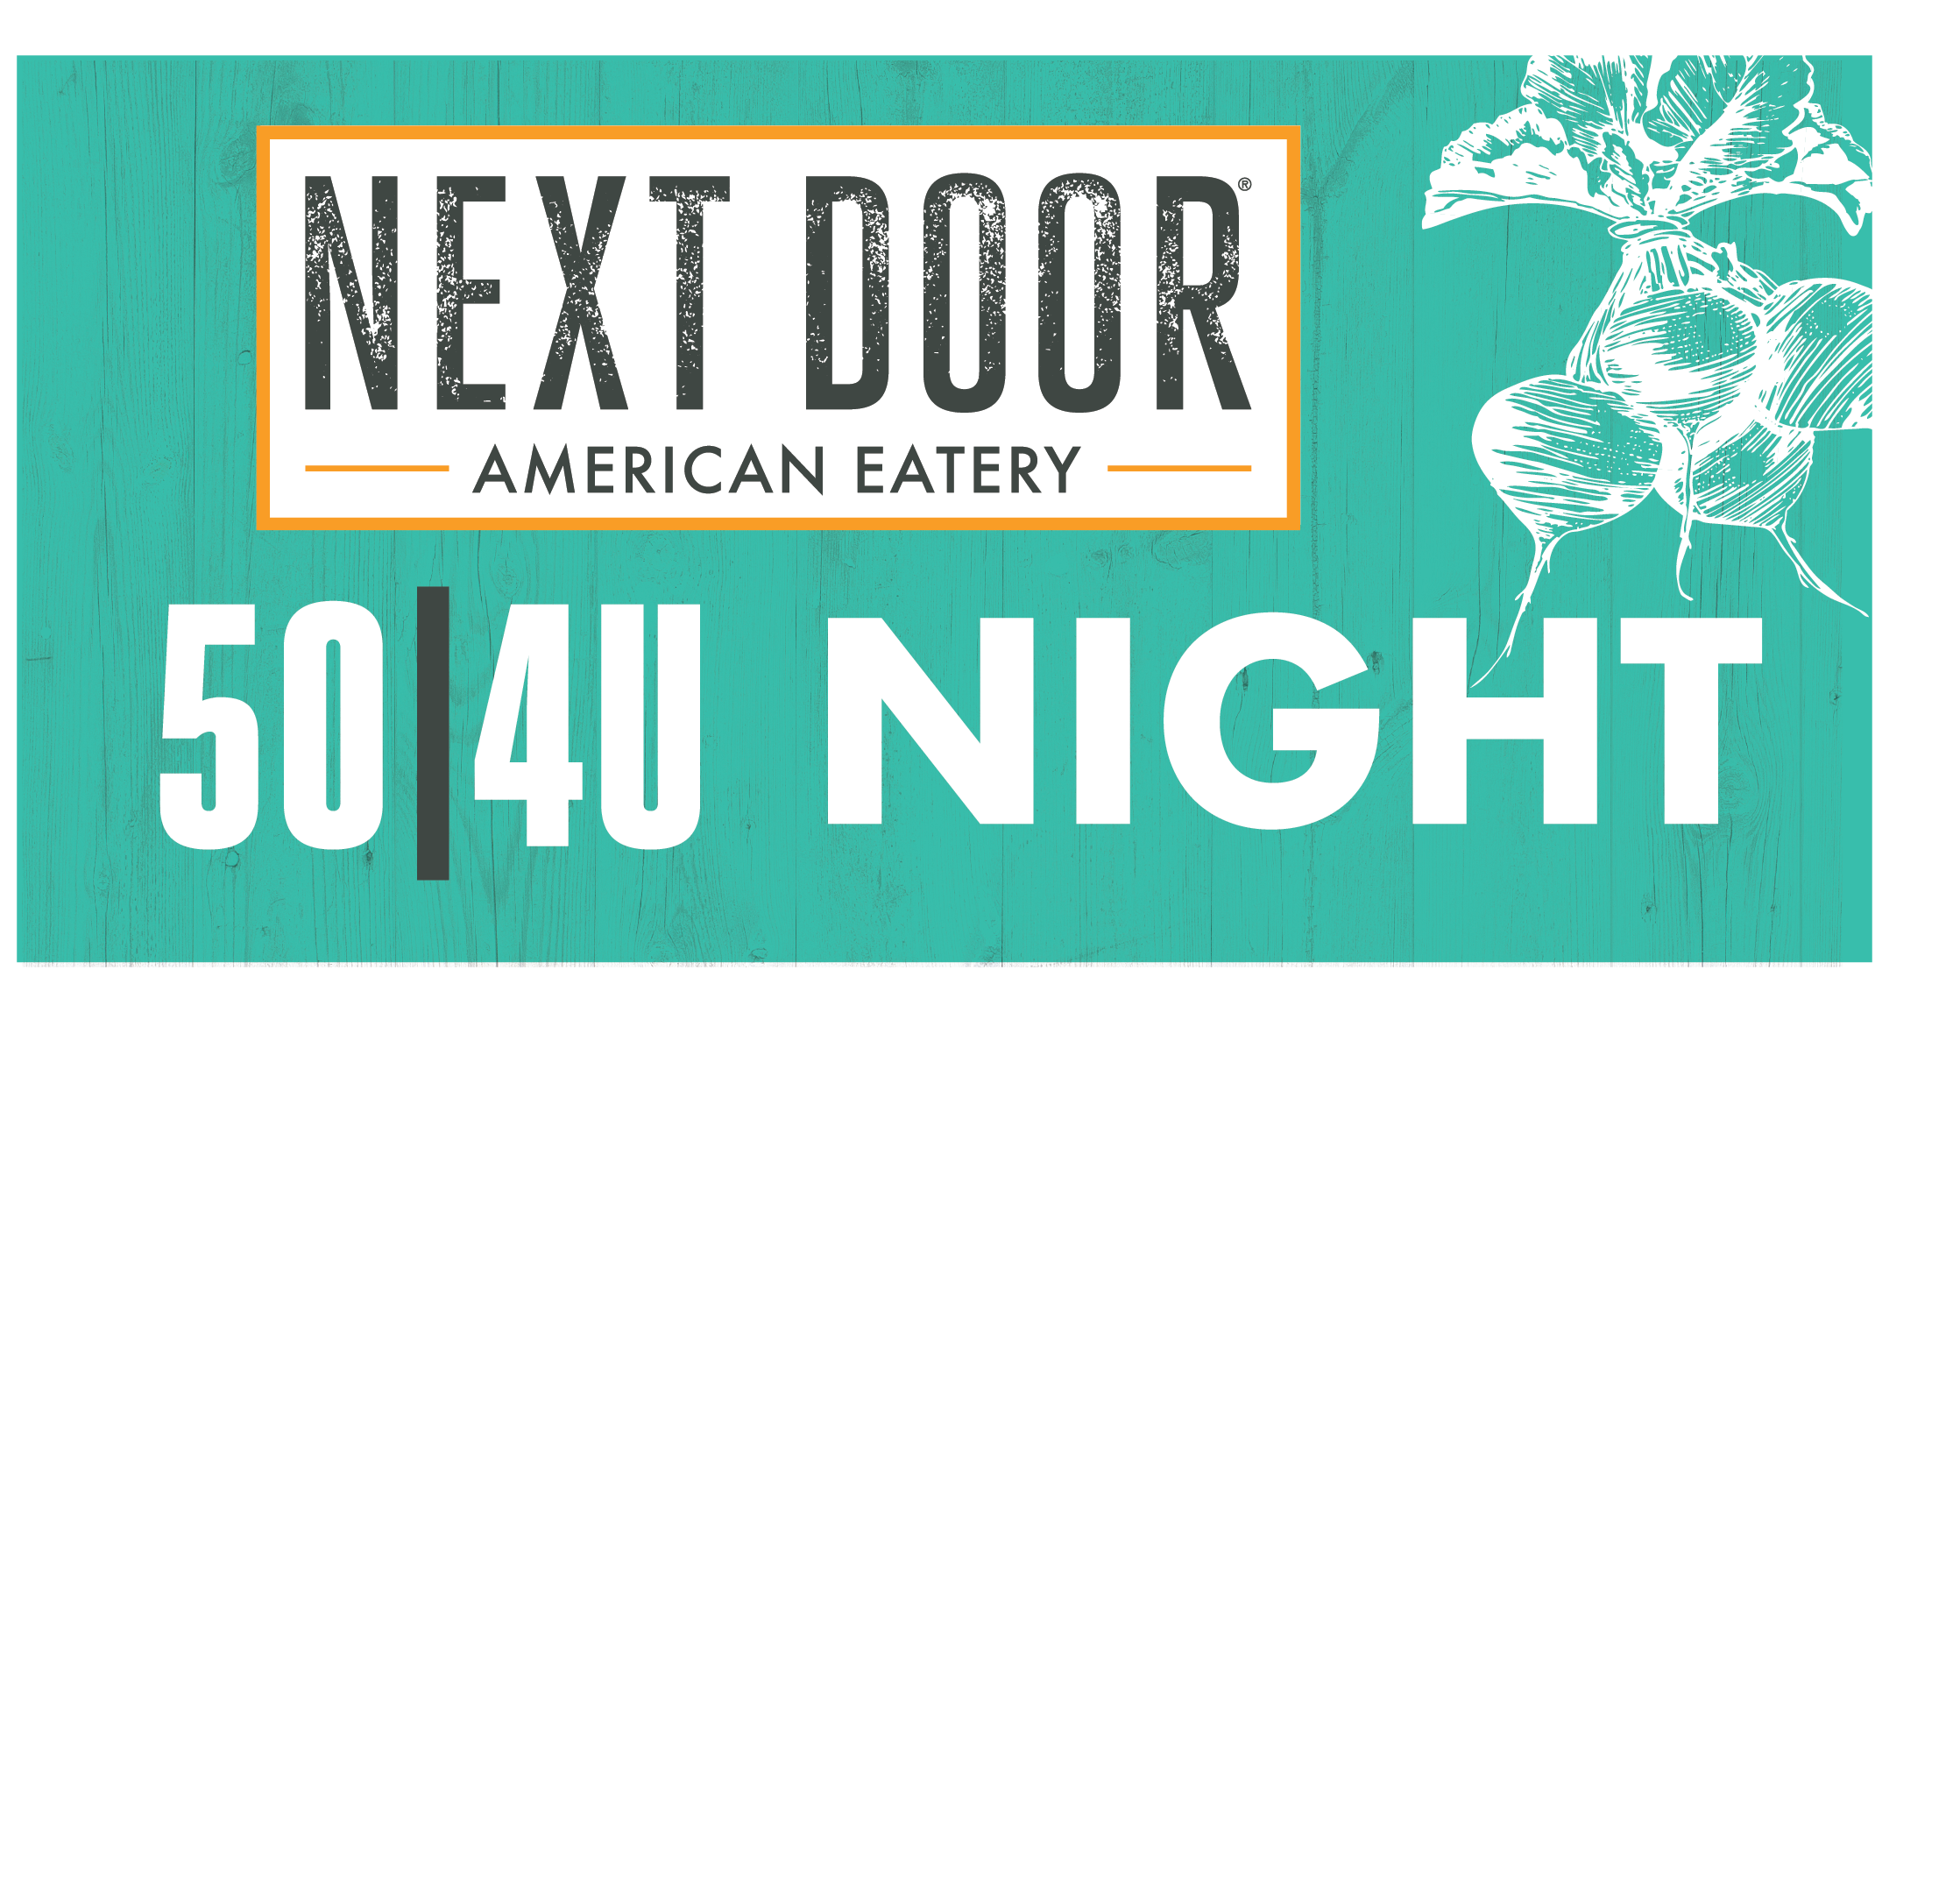 Montessori School of Denver 50 4U Night at Ne